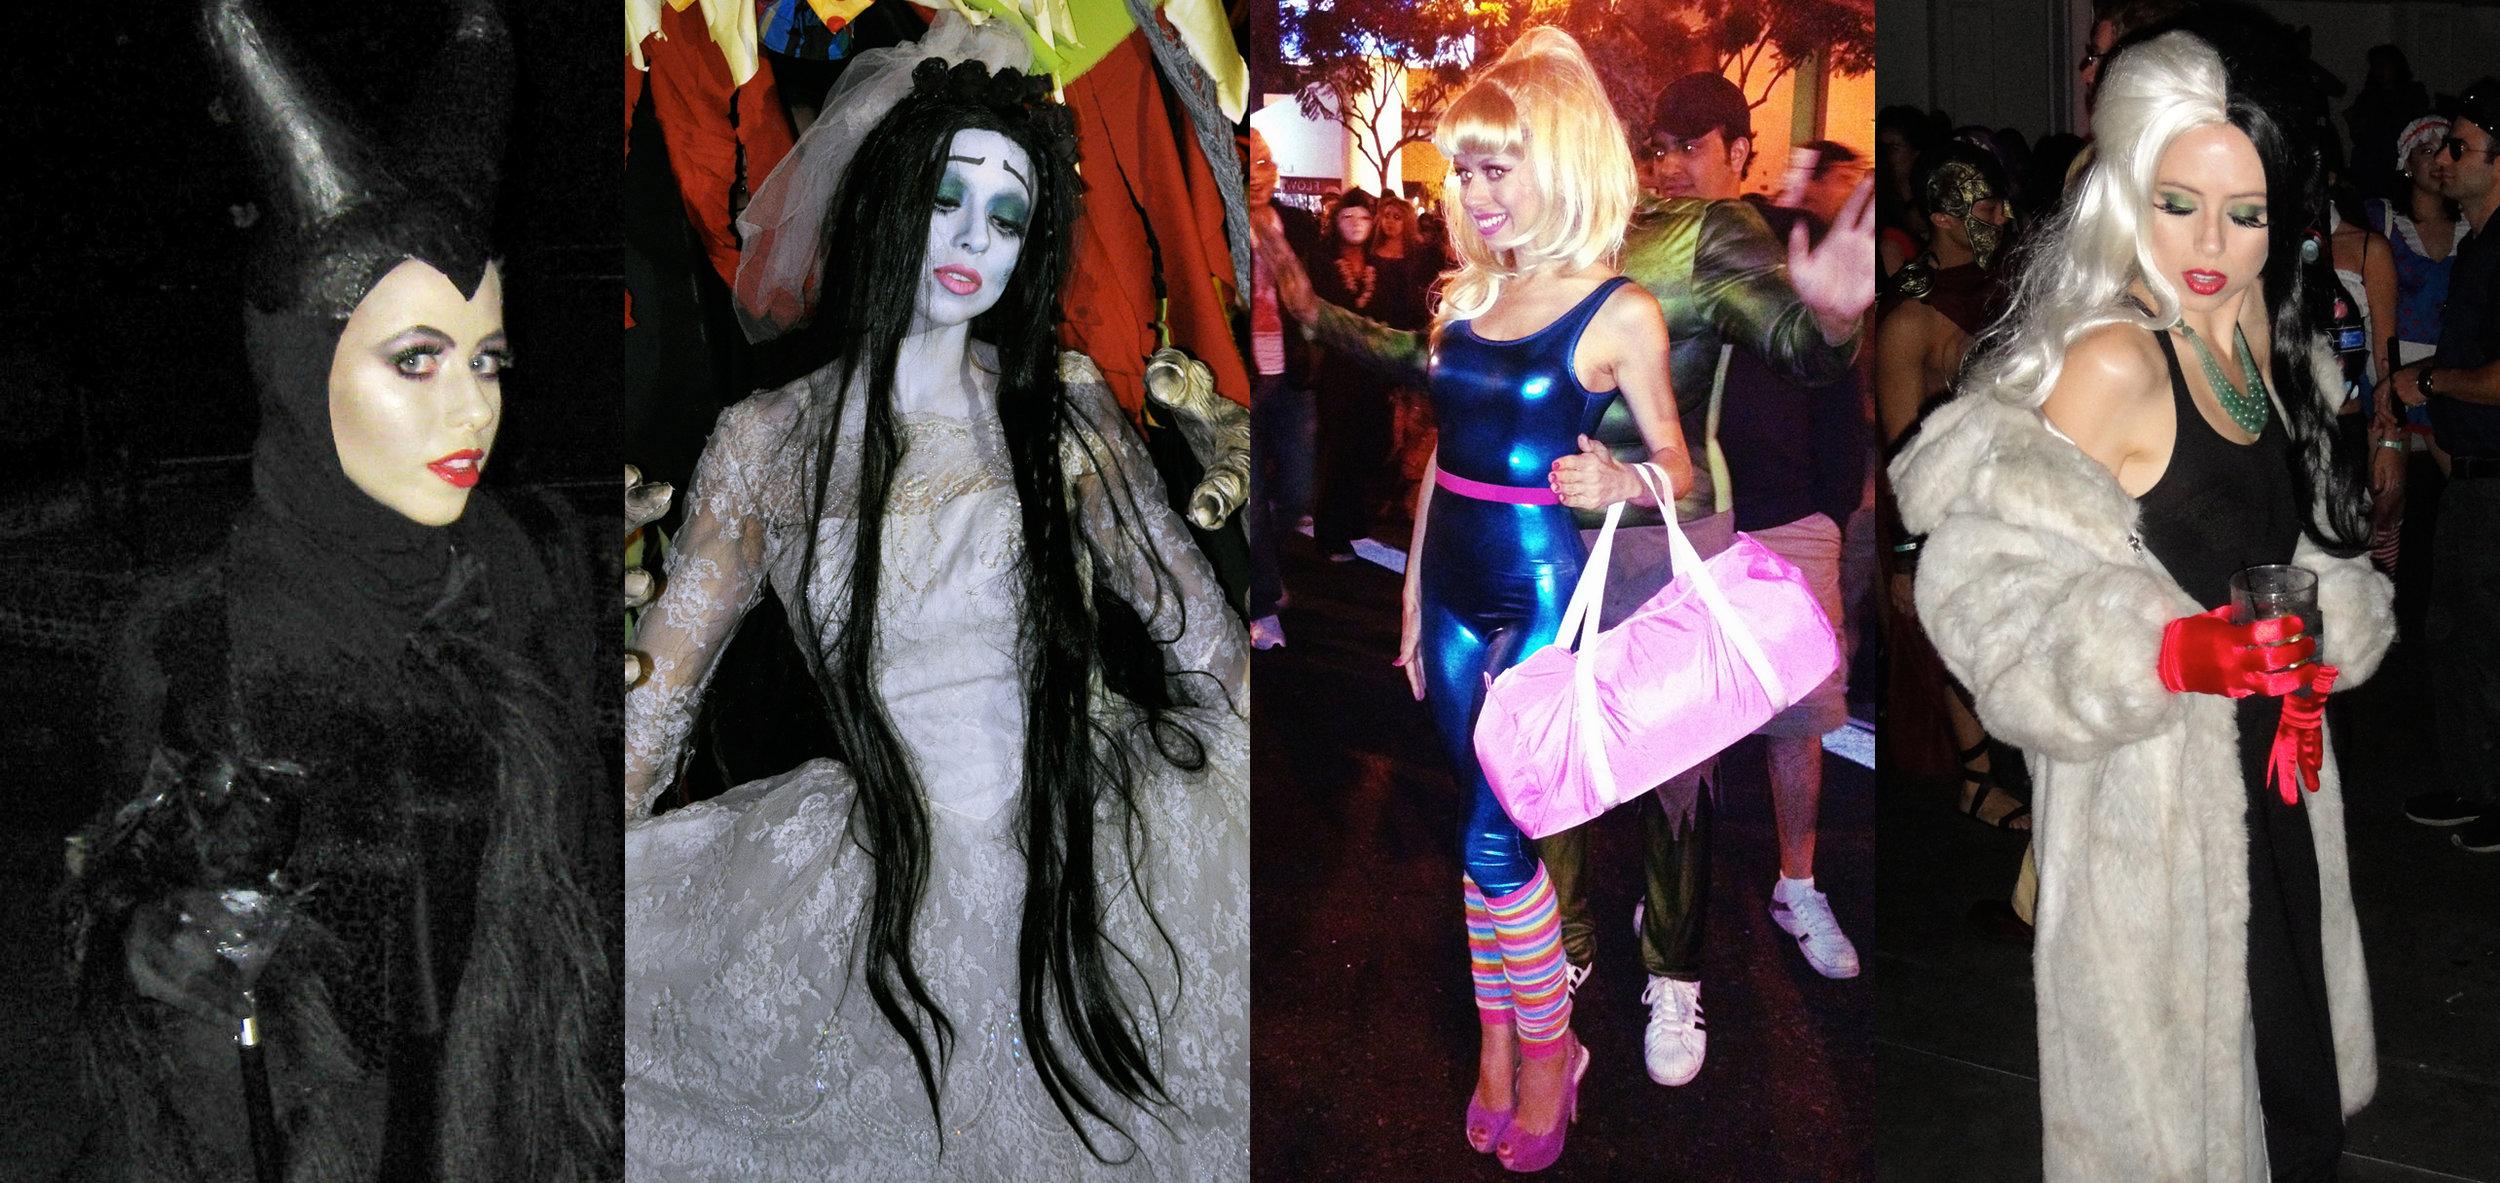 DIY costume lookbook -